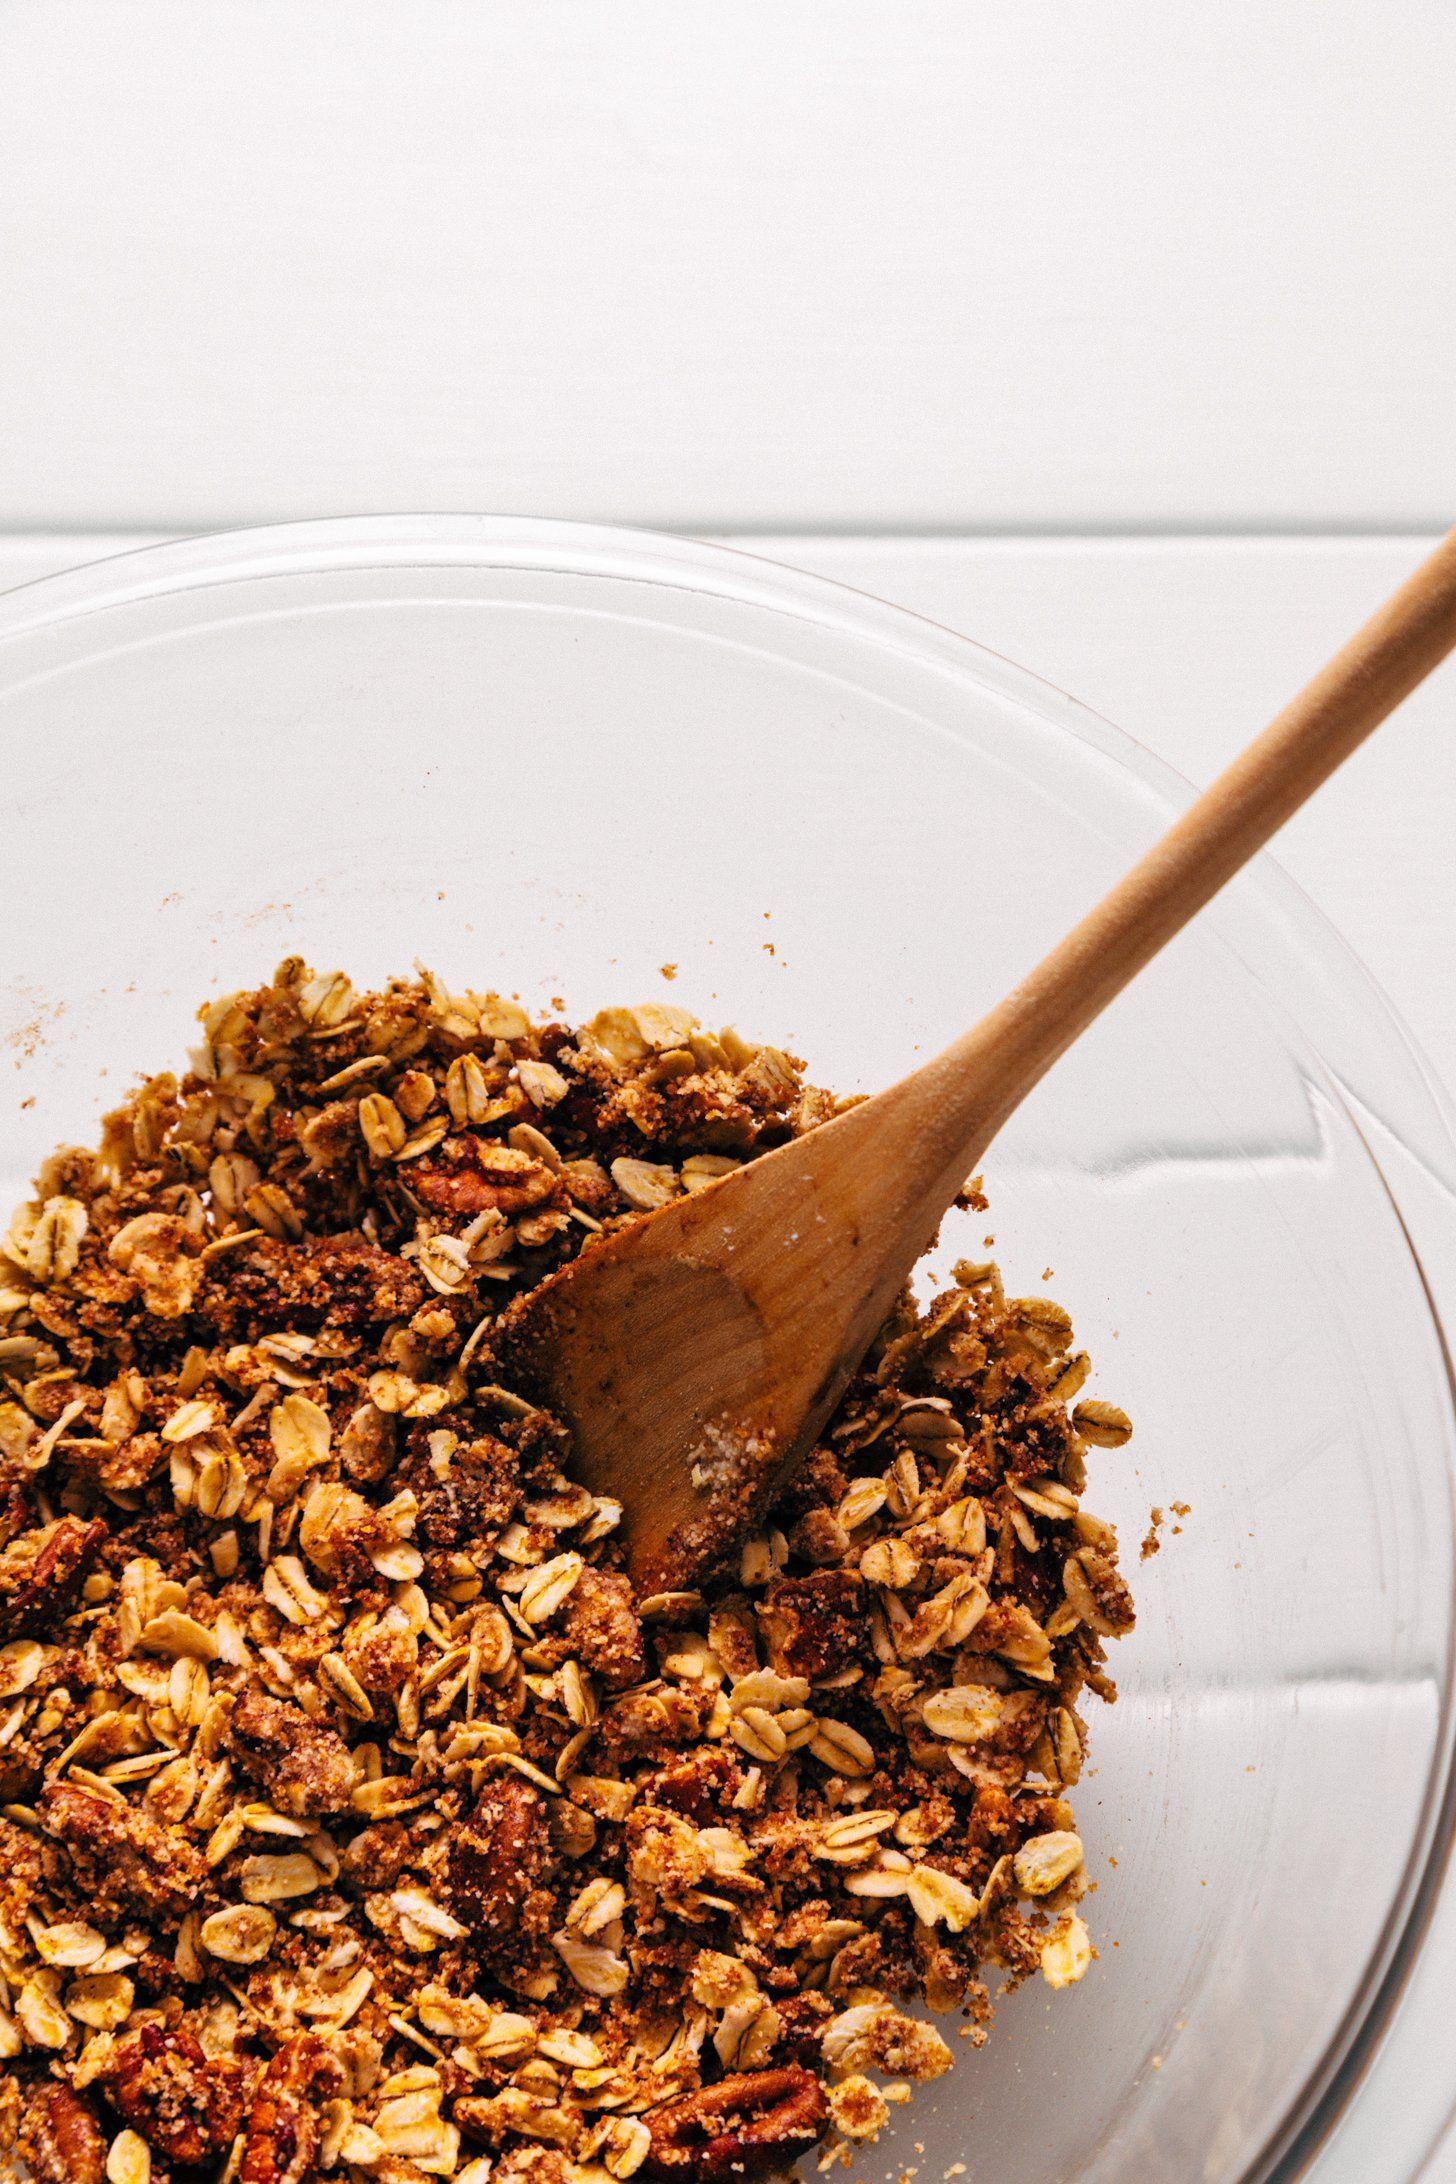 Healthified Apple Crisp 1 Bowl Minimalist Baker Recipes Recipe Apple Crisp Healthy Apple Crisp Baker Recipes